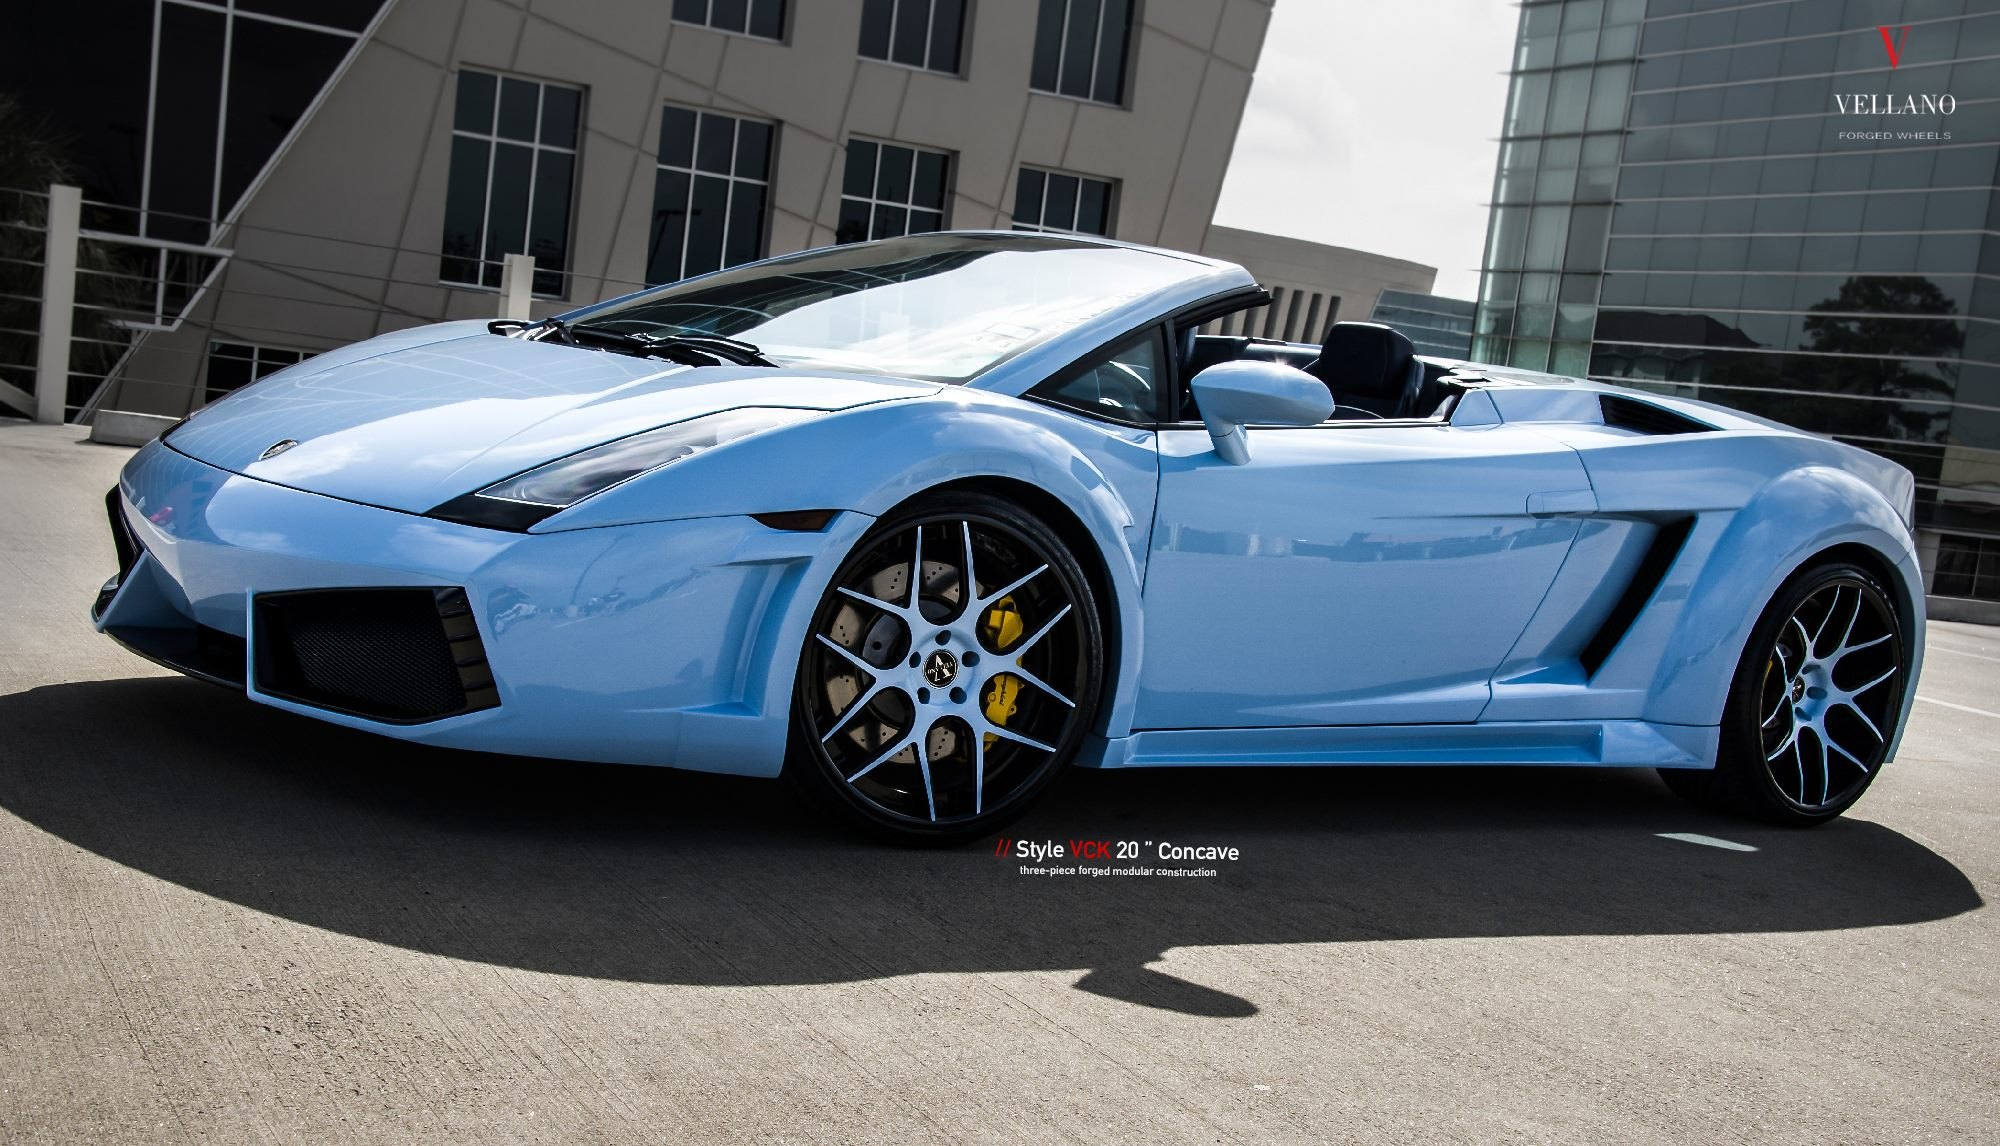 Custom Blue Convertible Lamborghini Gallardo Photo By Vellano